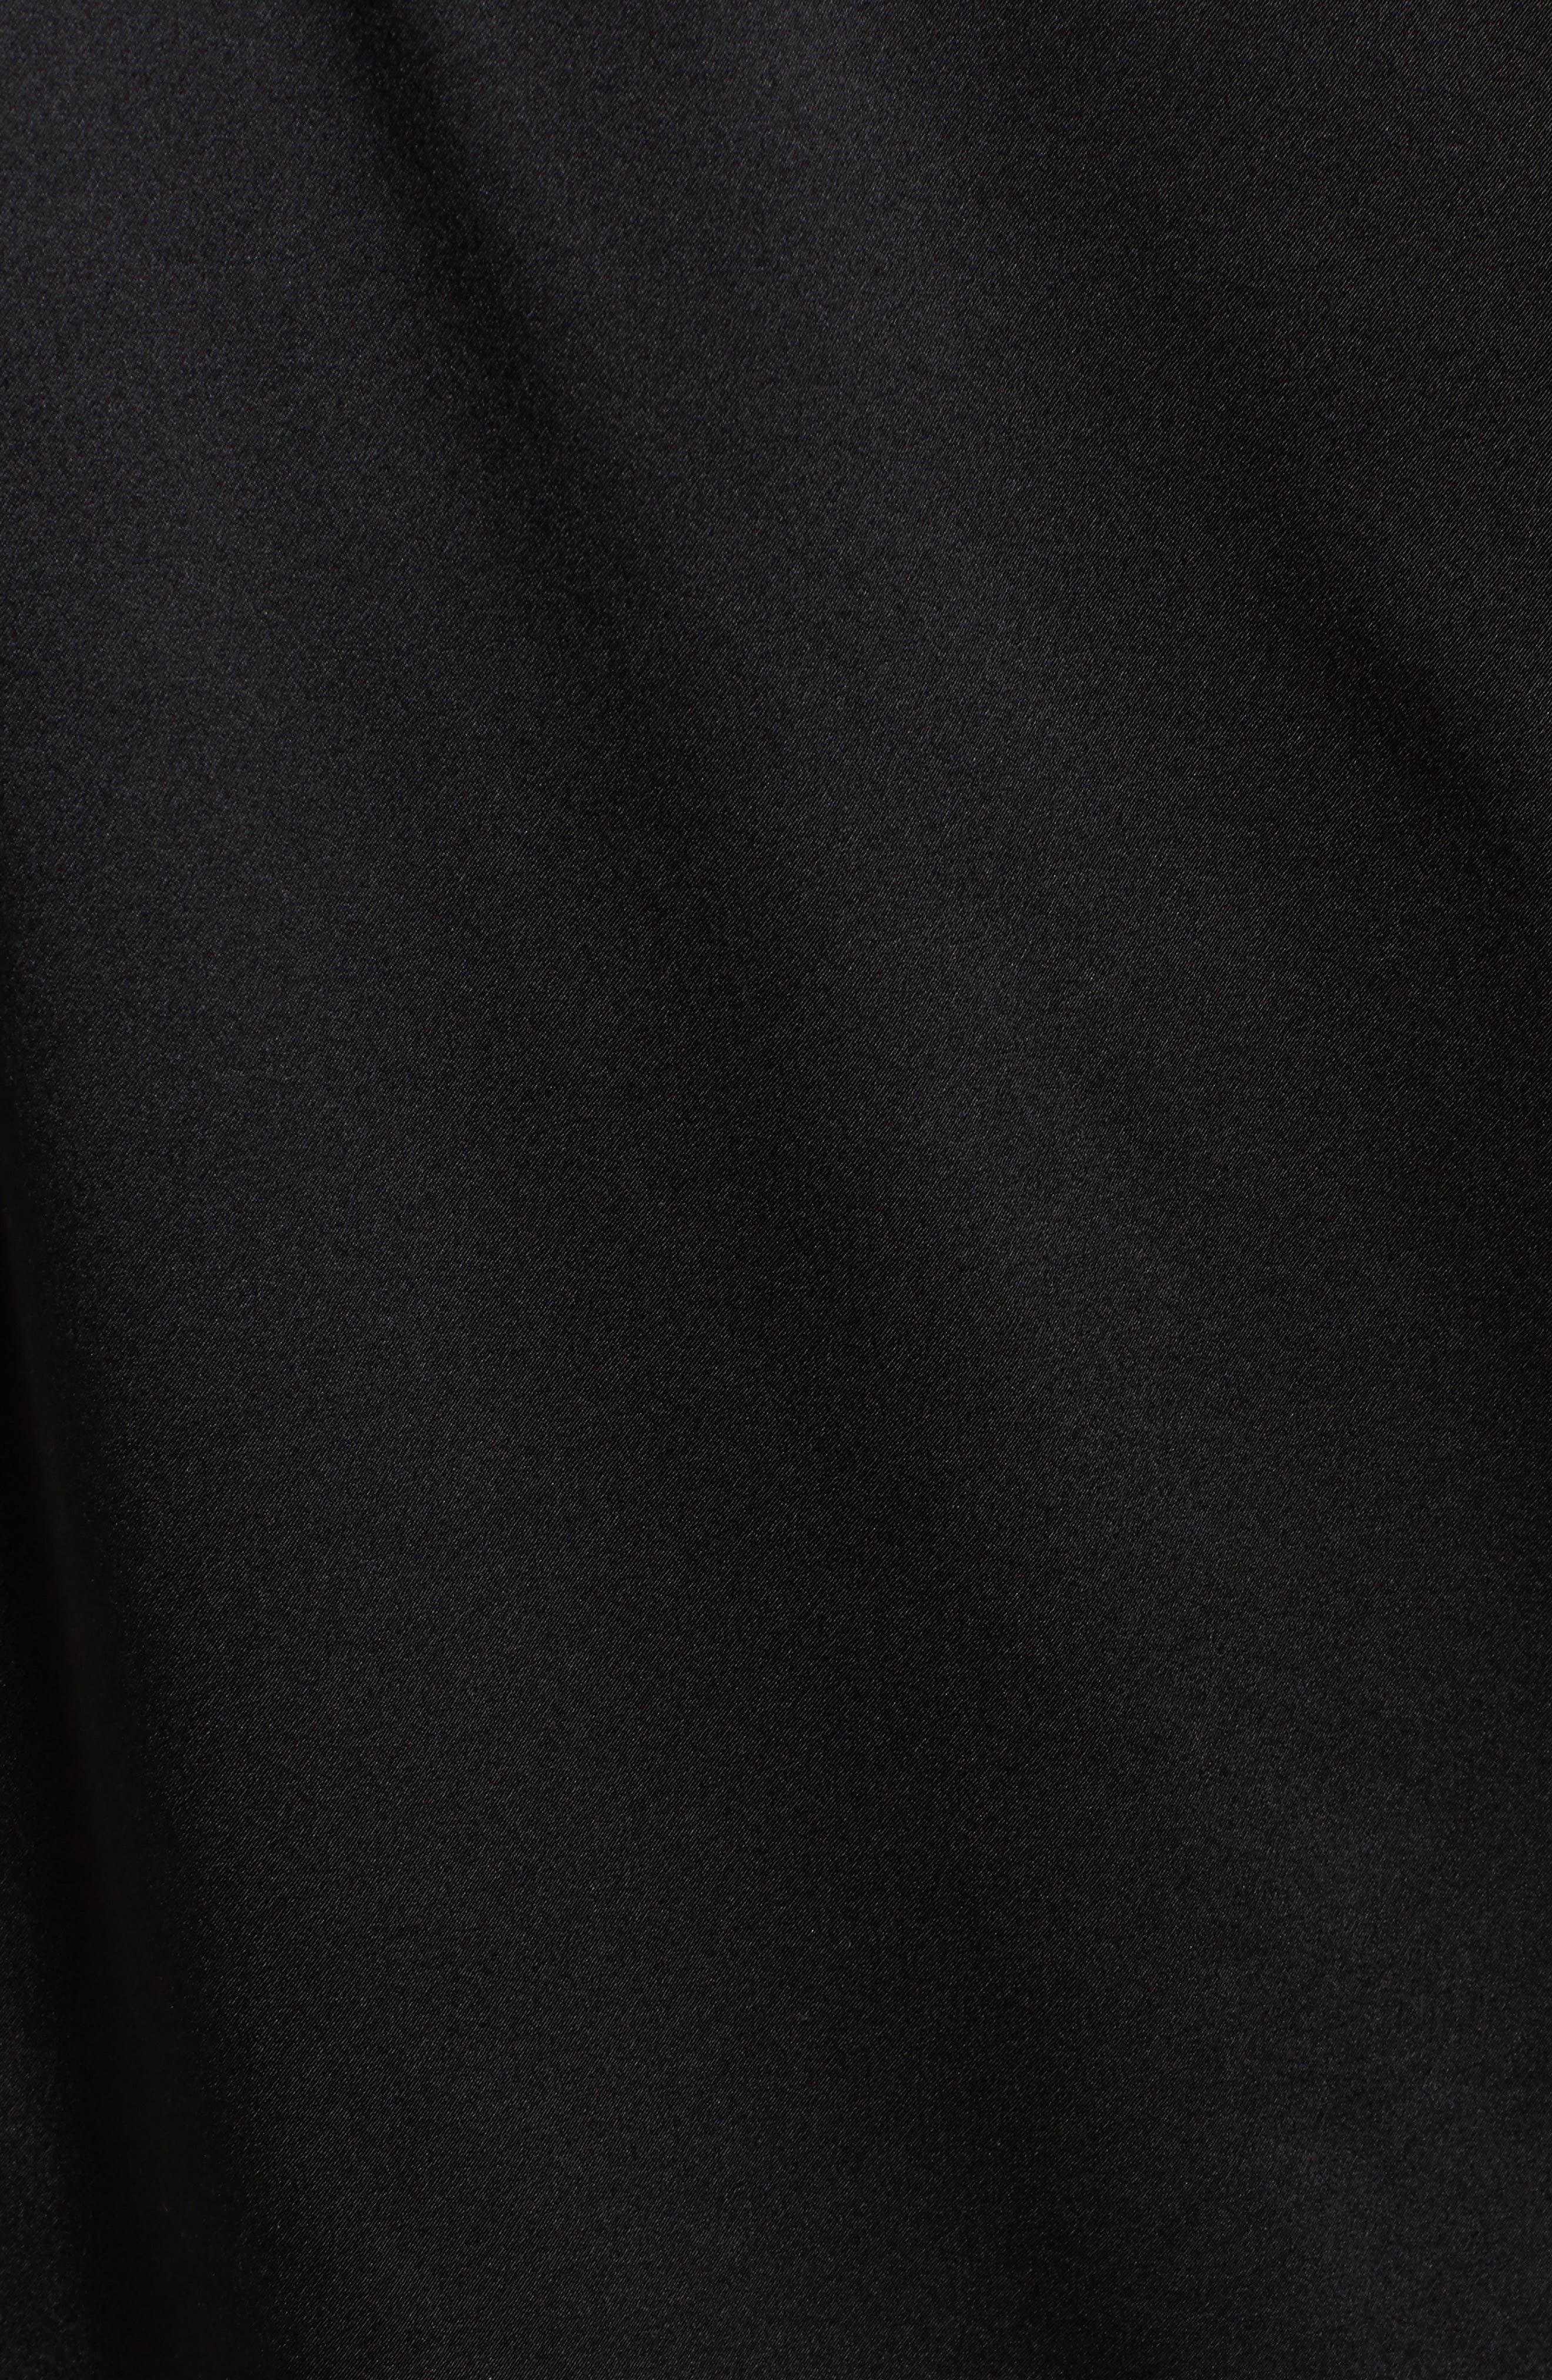 Ripley One-Shoulder Silk Blouse,                             Alternate thumbnail 5, color,                             Black